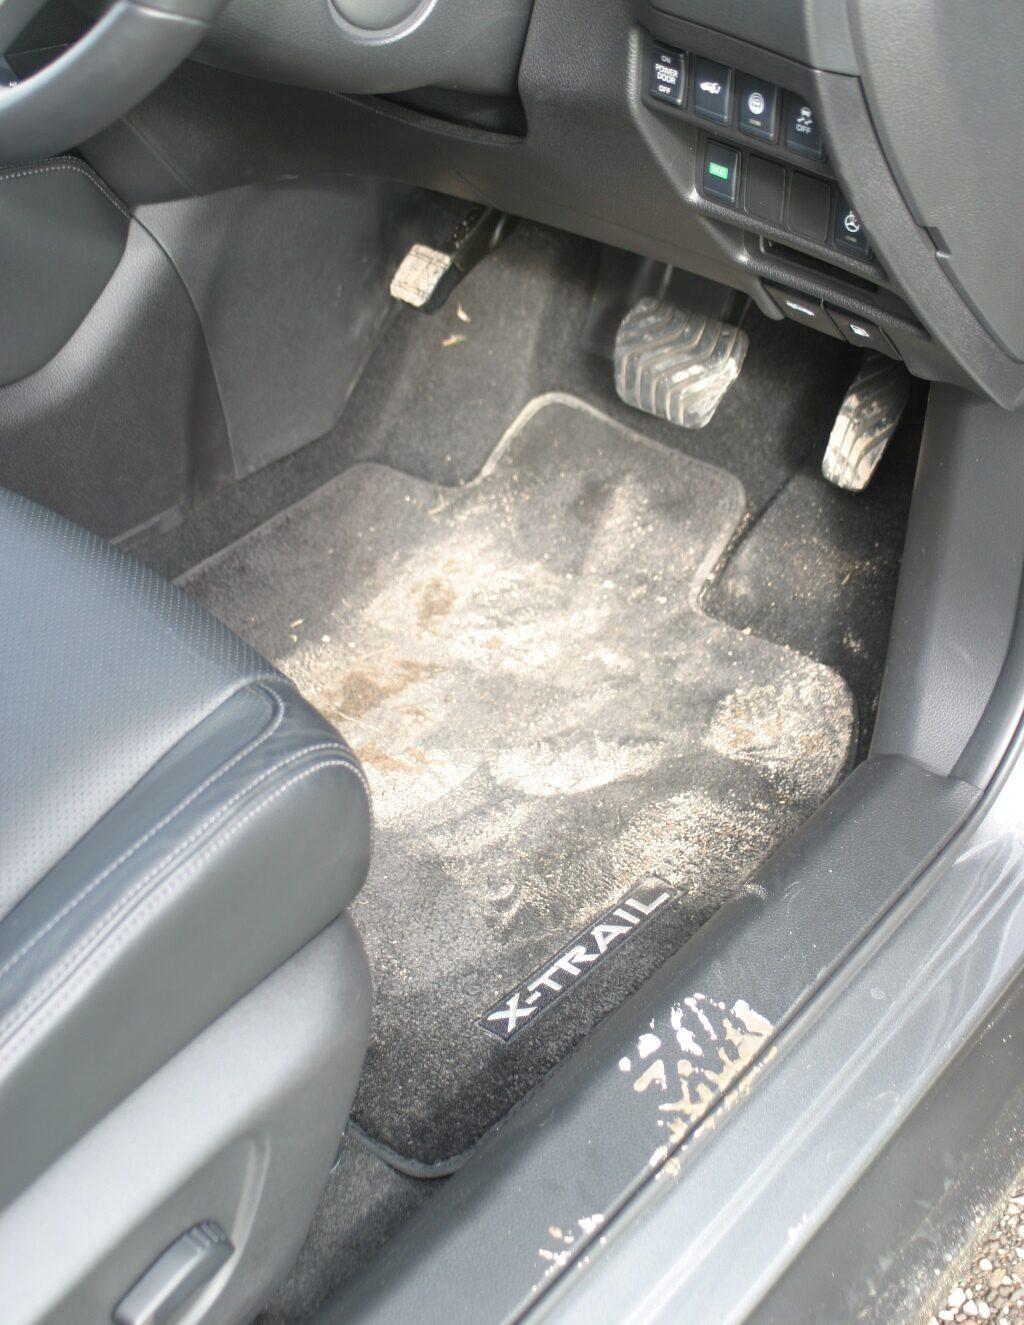 Nissan X-Trail Ti with muddy foot prints on carpet